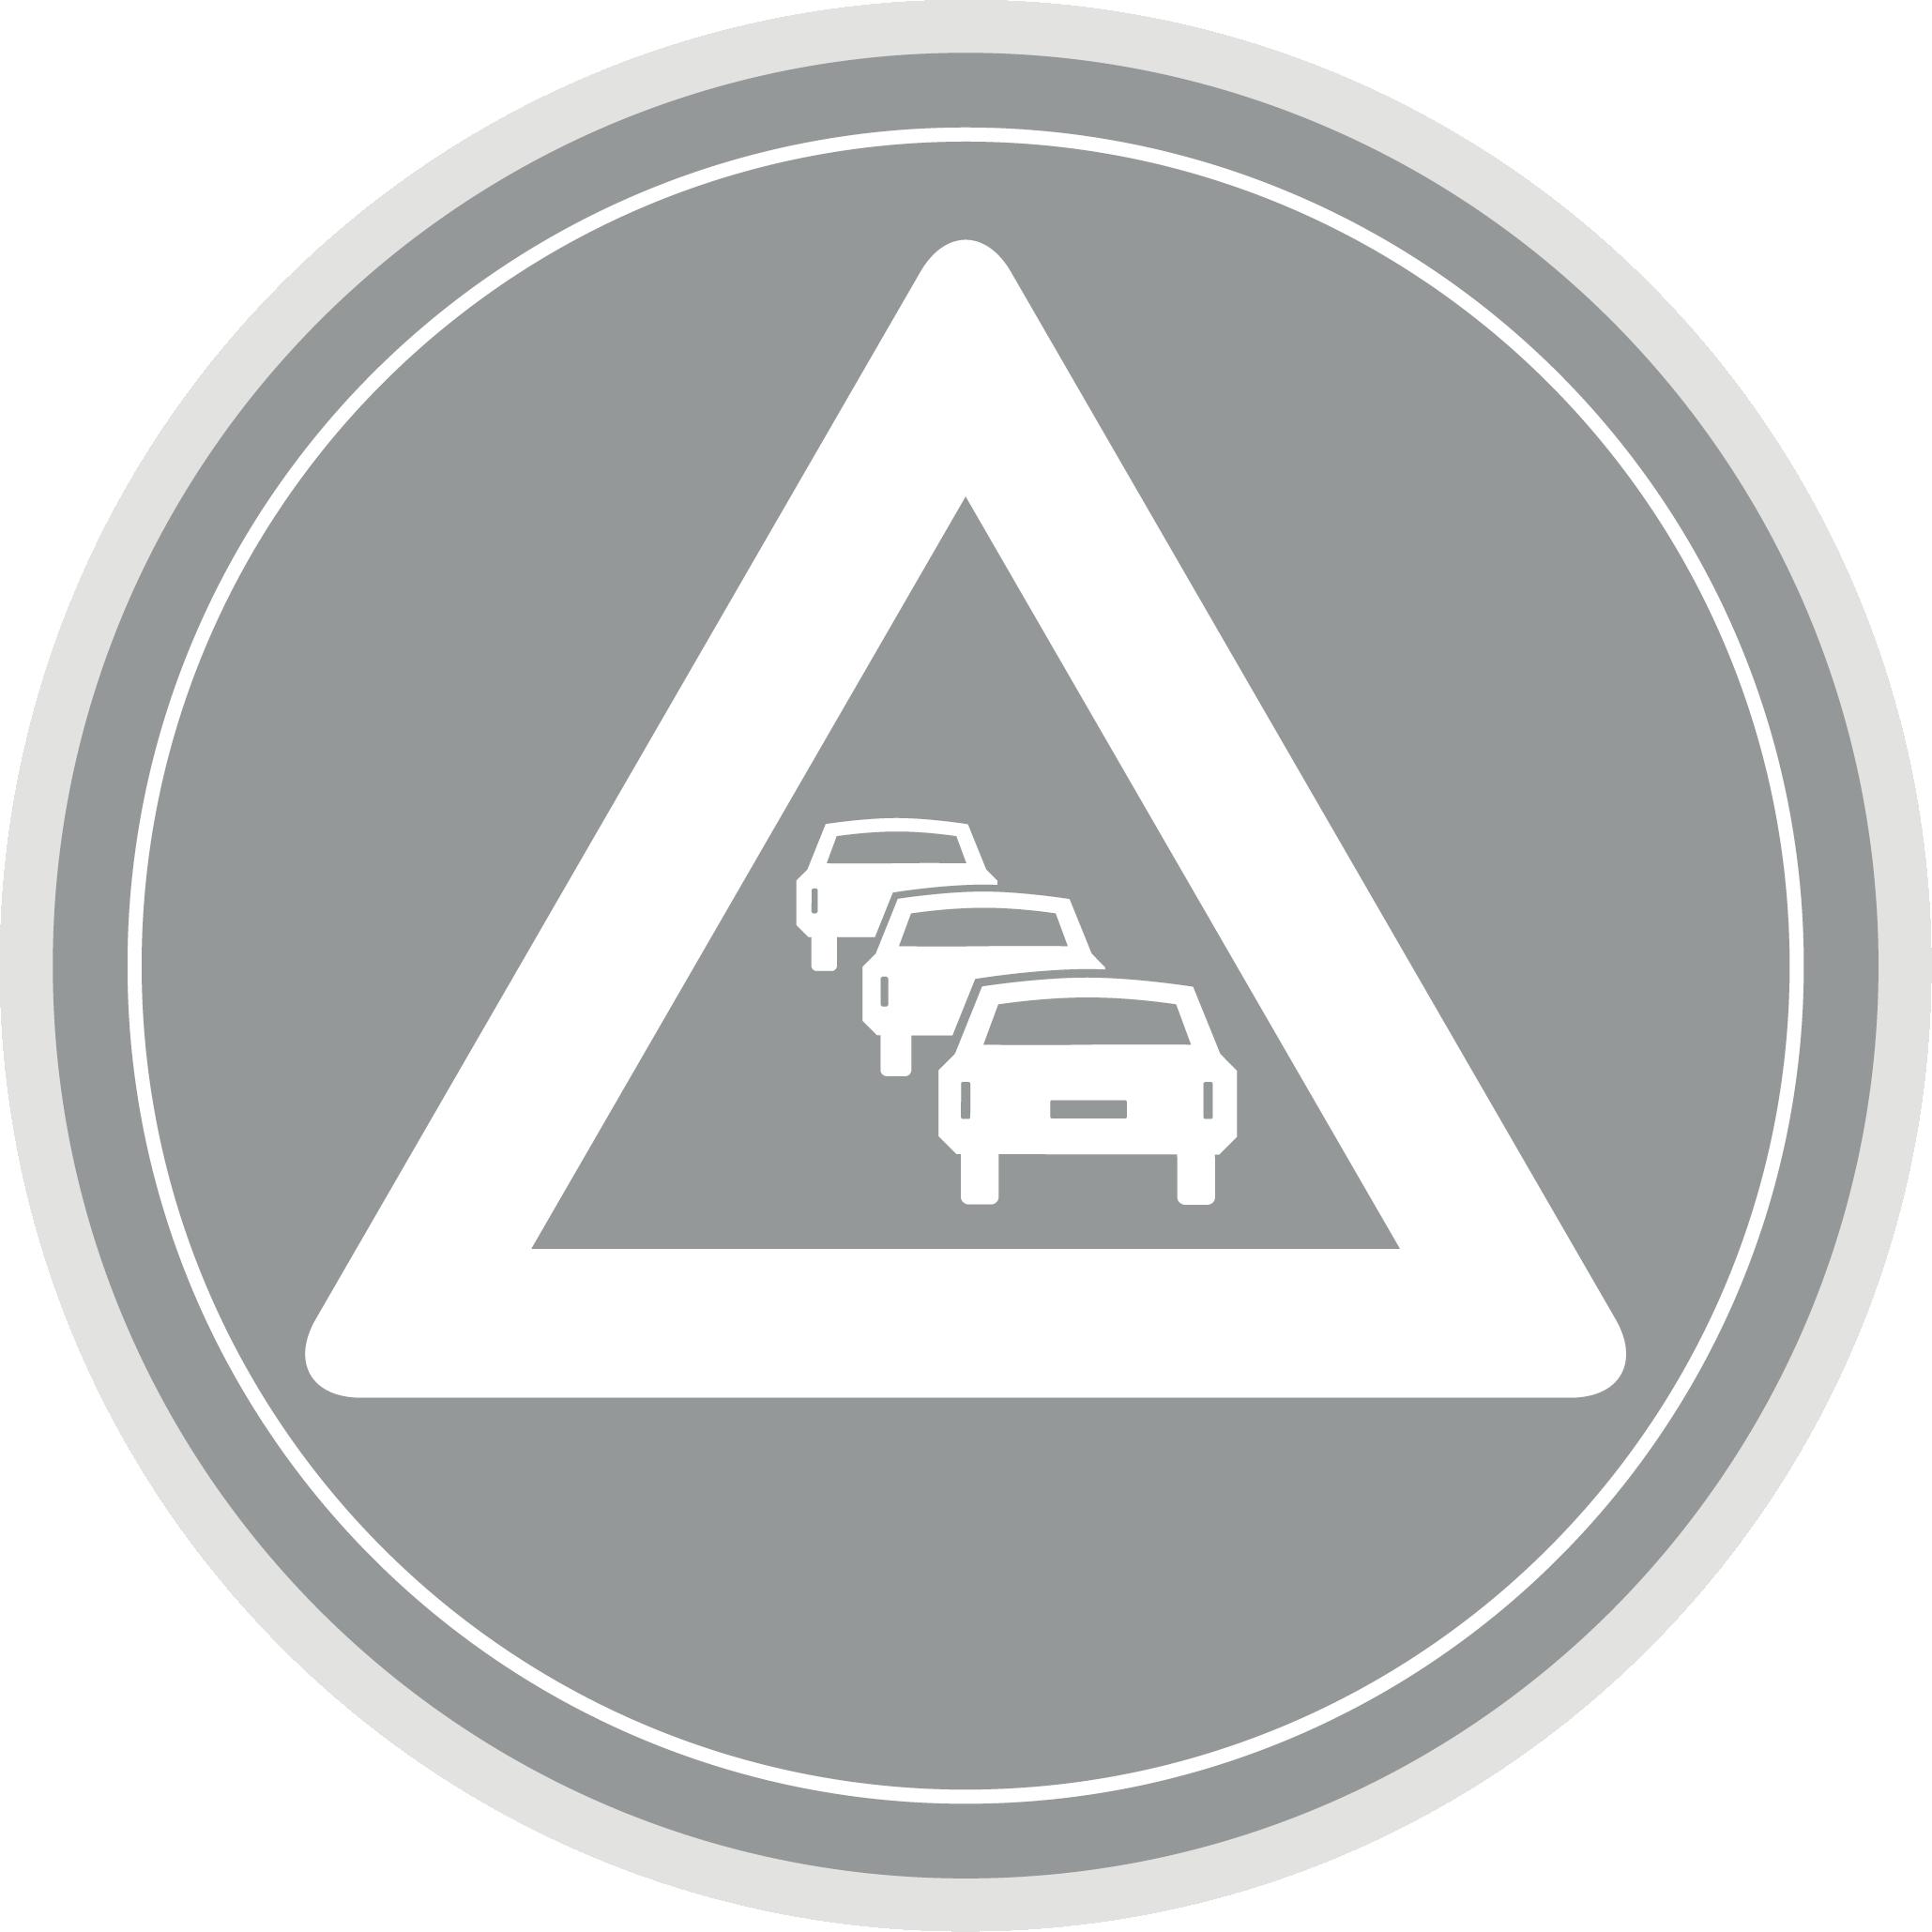 new_icon14-grey